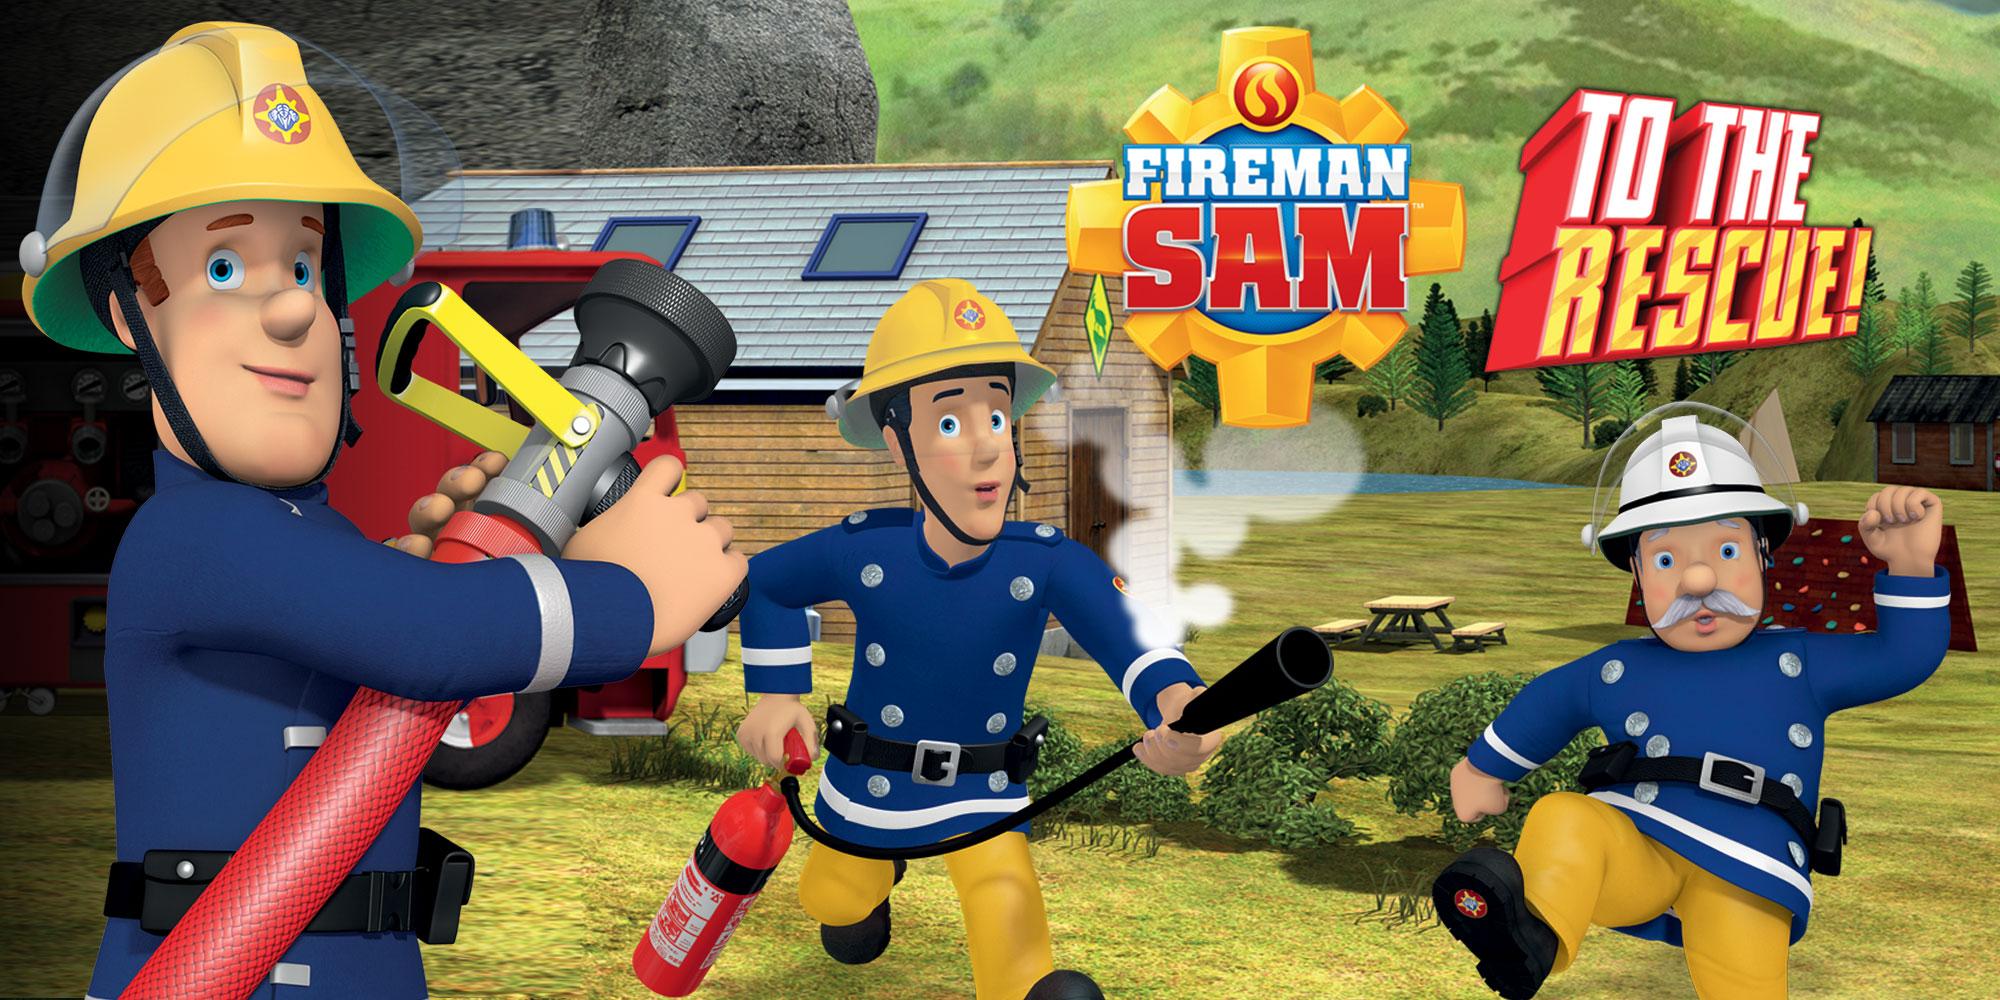 Fireman Sam 3d Wallpaper Fireman Sam To The Rescue Nintendo 3ds Games Nintendo